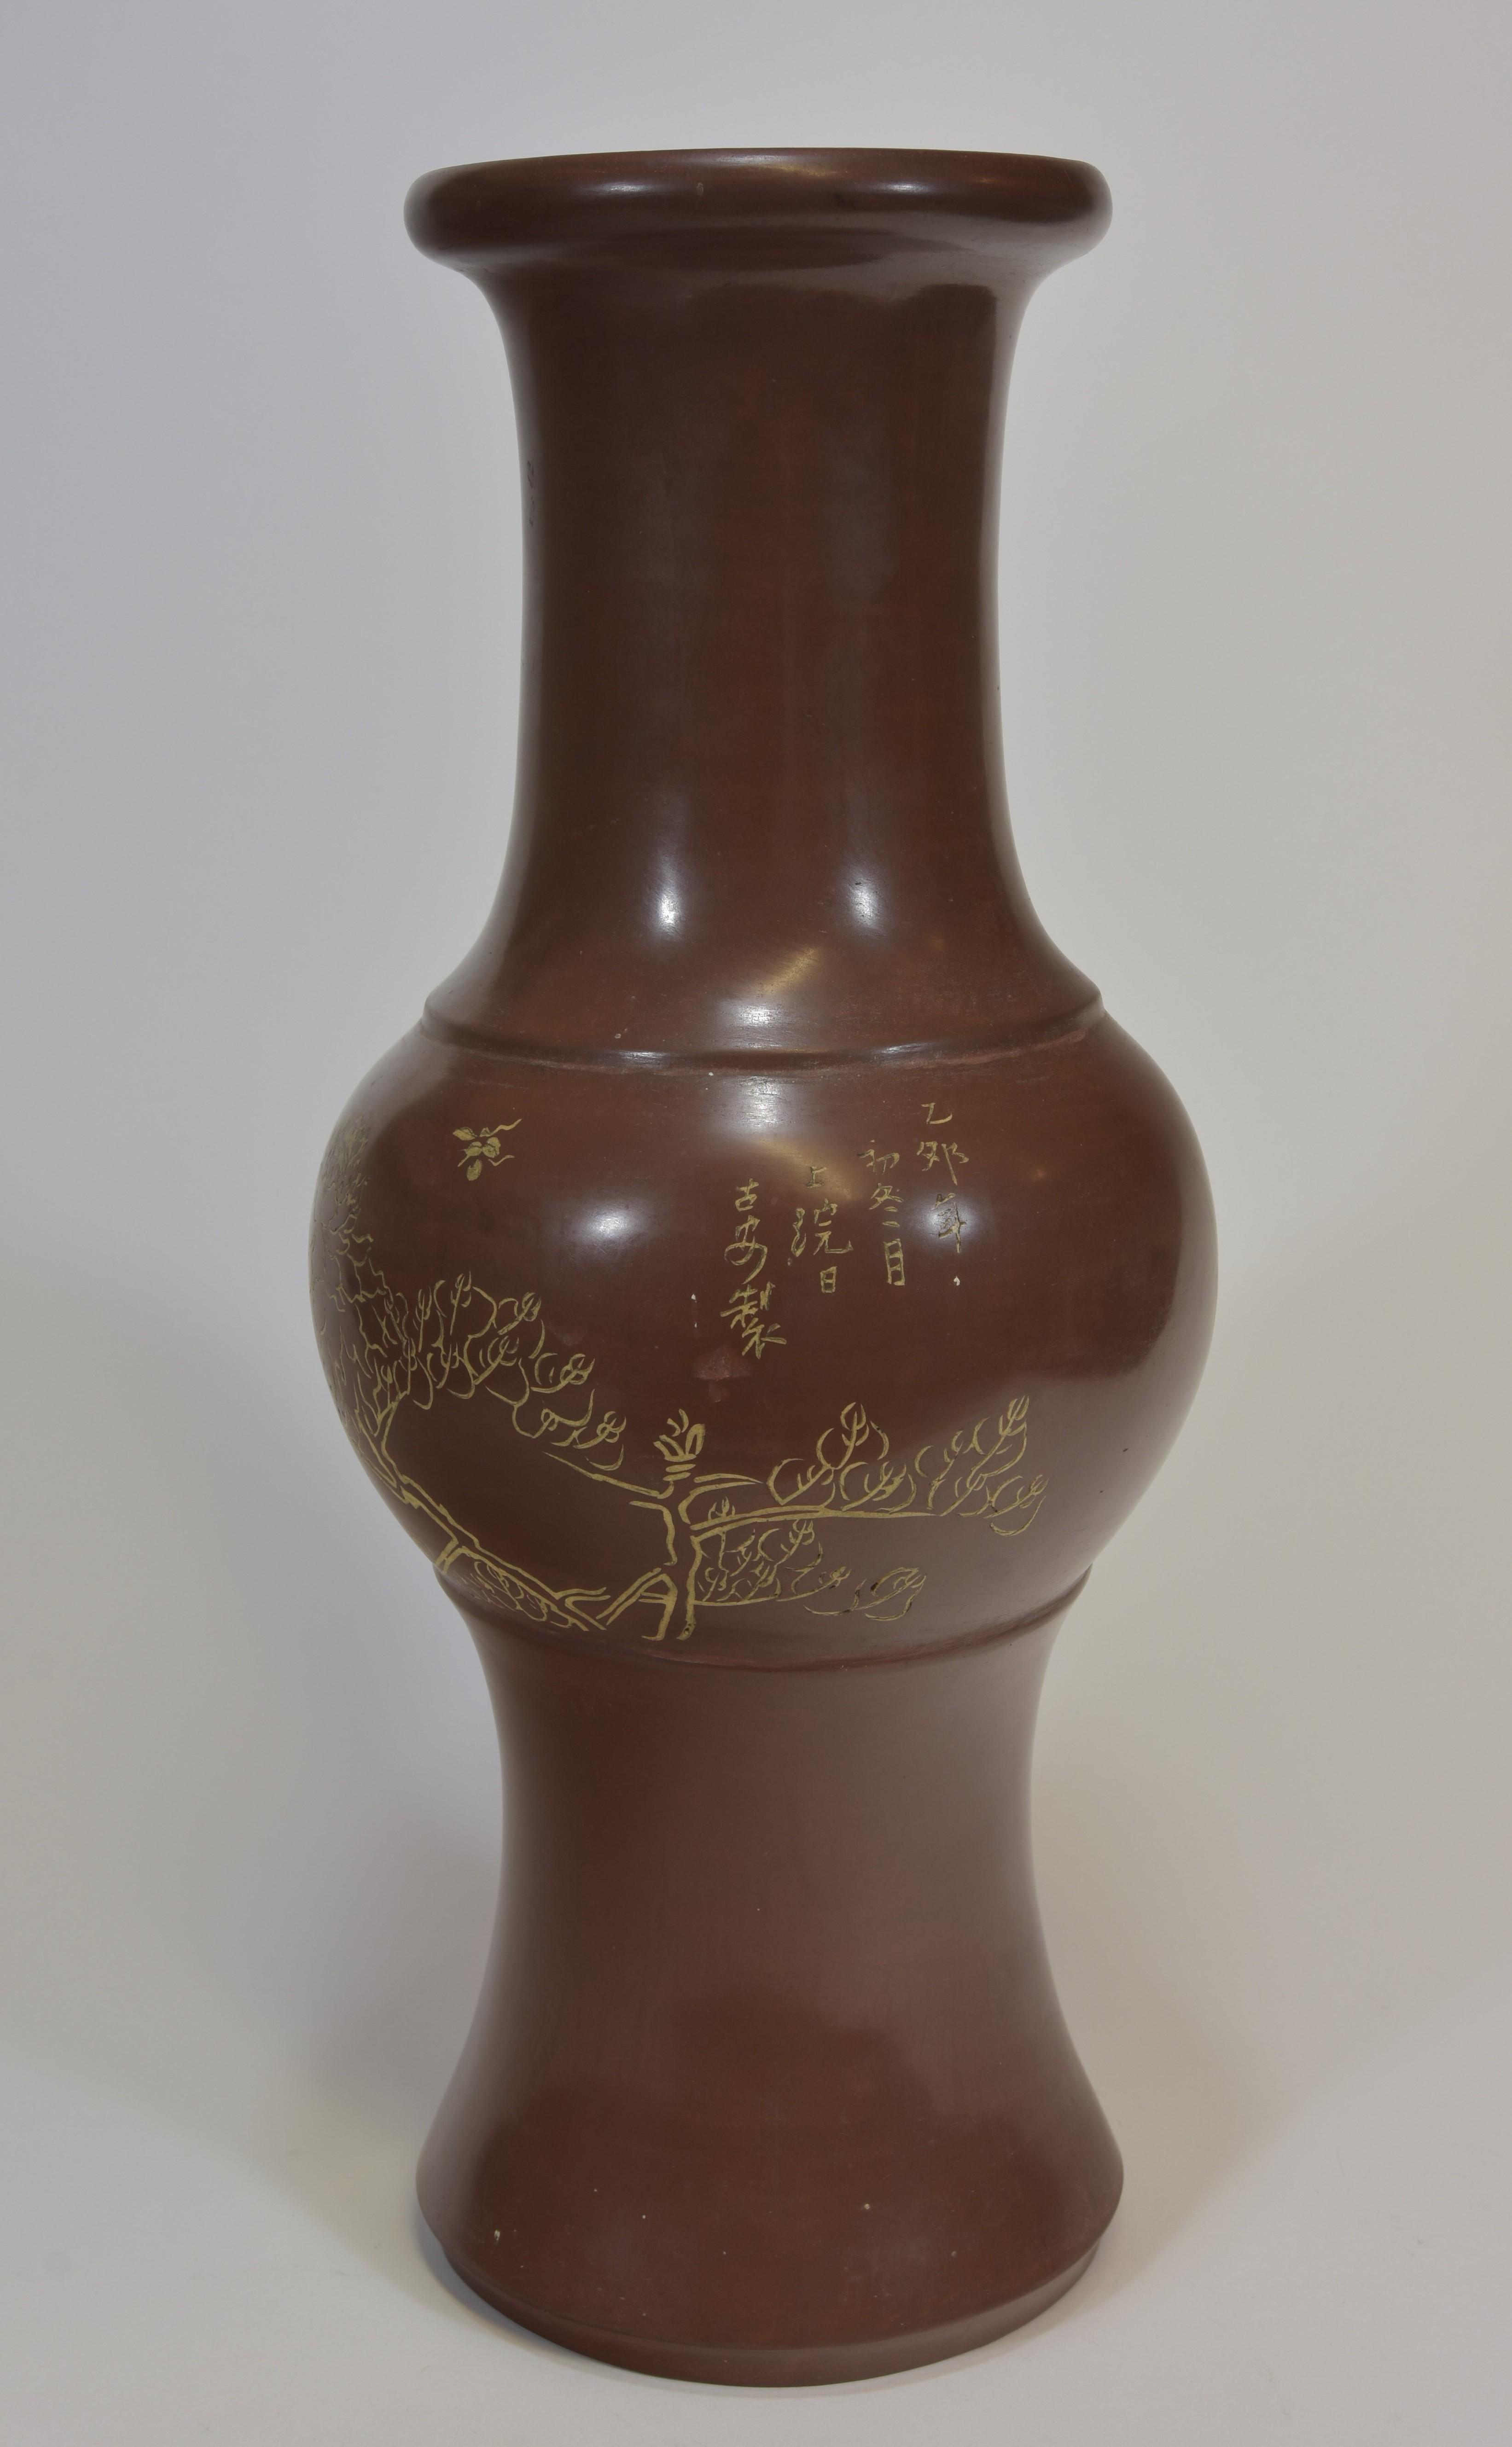 Lot 46 - A 20th century Yixing vase 38cm文革時代 宜興紫紗大花尊